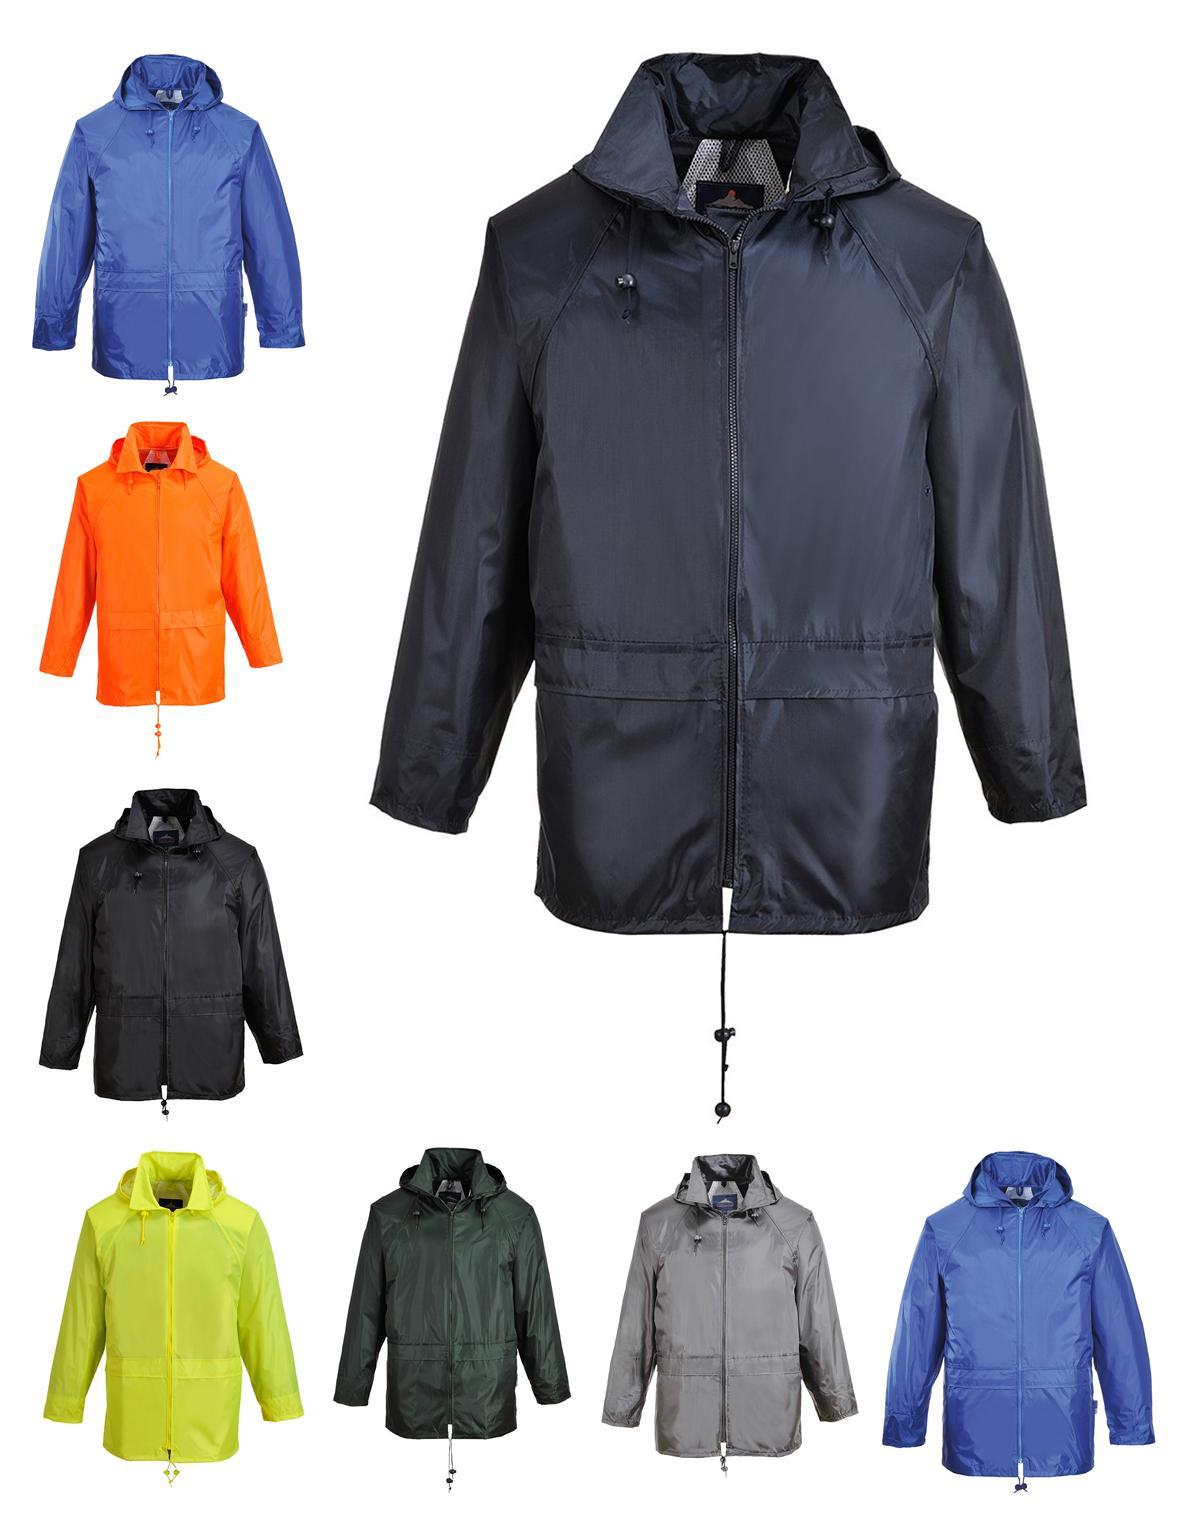 classic rain jacket waterproof hooded thermal zipped